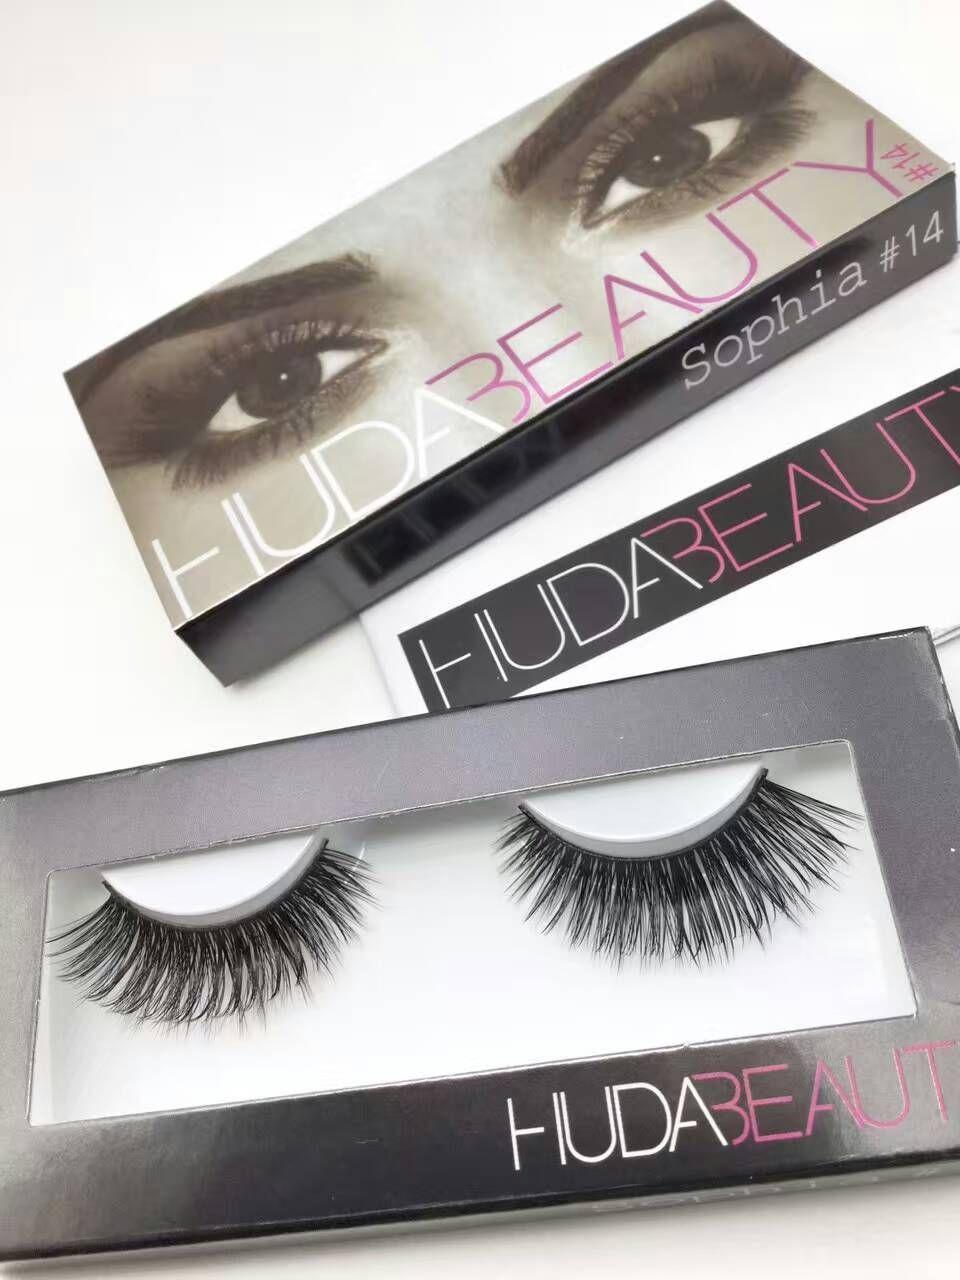 bbcc91736cd Huda Beauty False Eyelashes Messy Cross Thick Natural Fake Eye Lashes  Professional Makeup Tip Bigeye Long ...